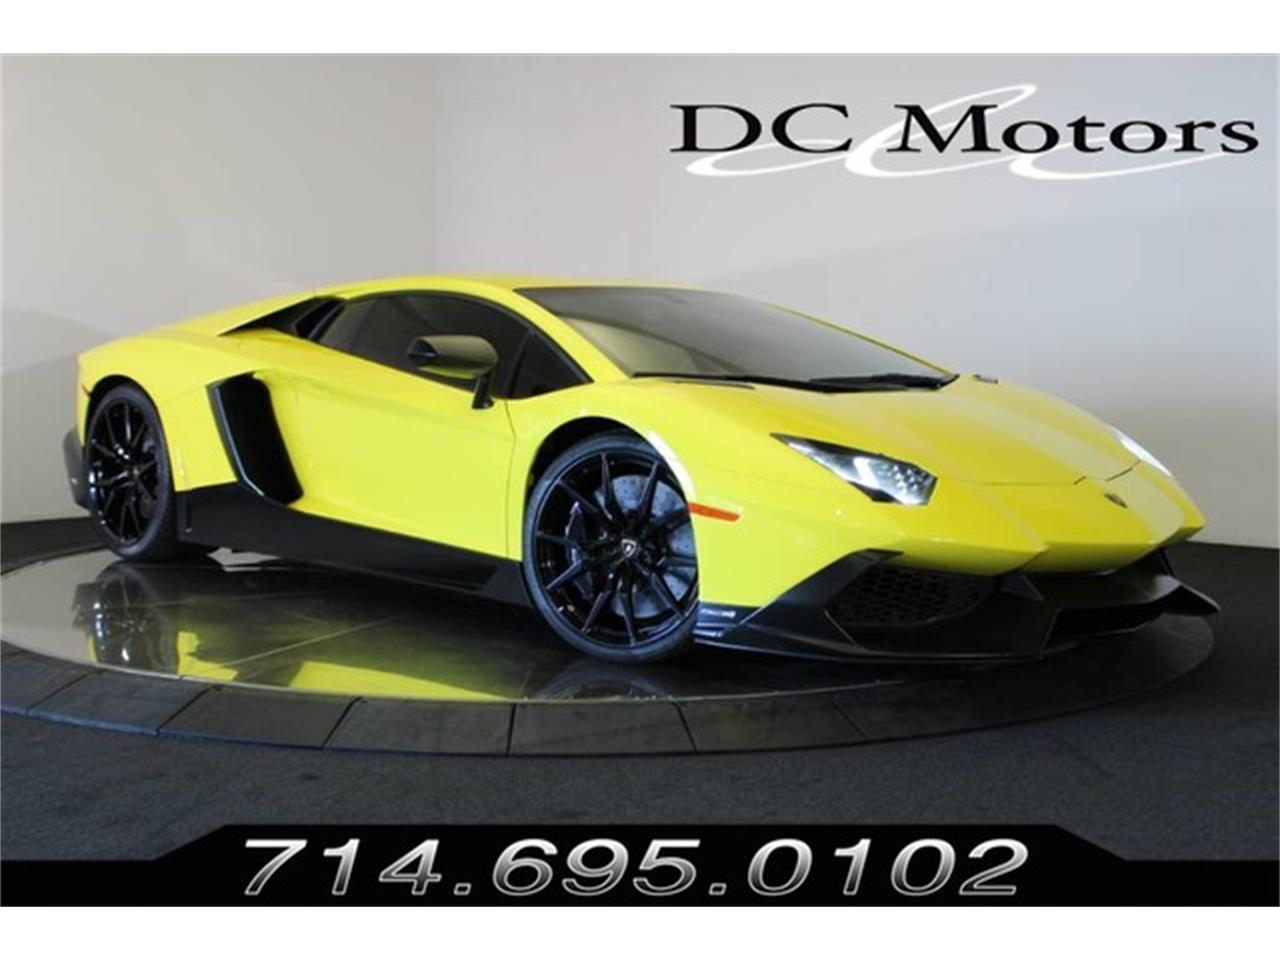 2014 Lamborghini Aventador For Sale Classiccars Com Cc 1167553